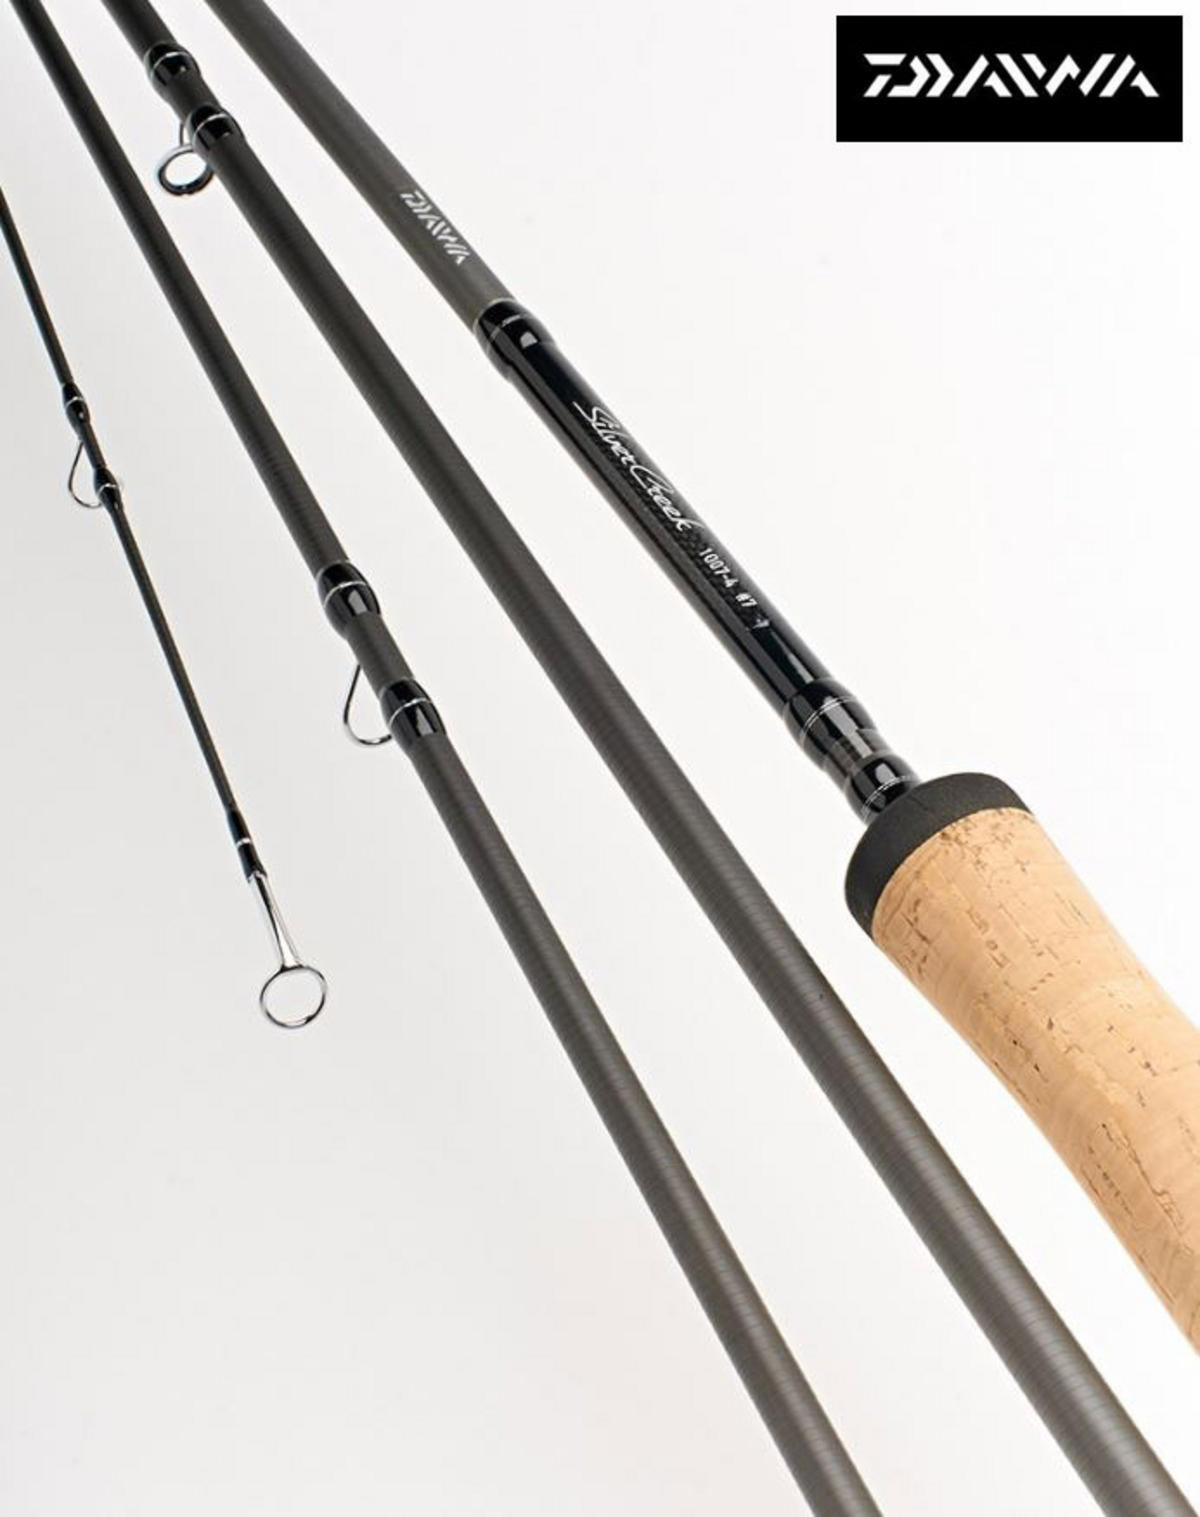 Ex Display Daiwa Silvercreek 9' 4pc #6 Fly Fishing Rod SCF9064-AU